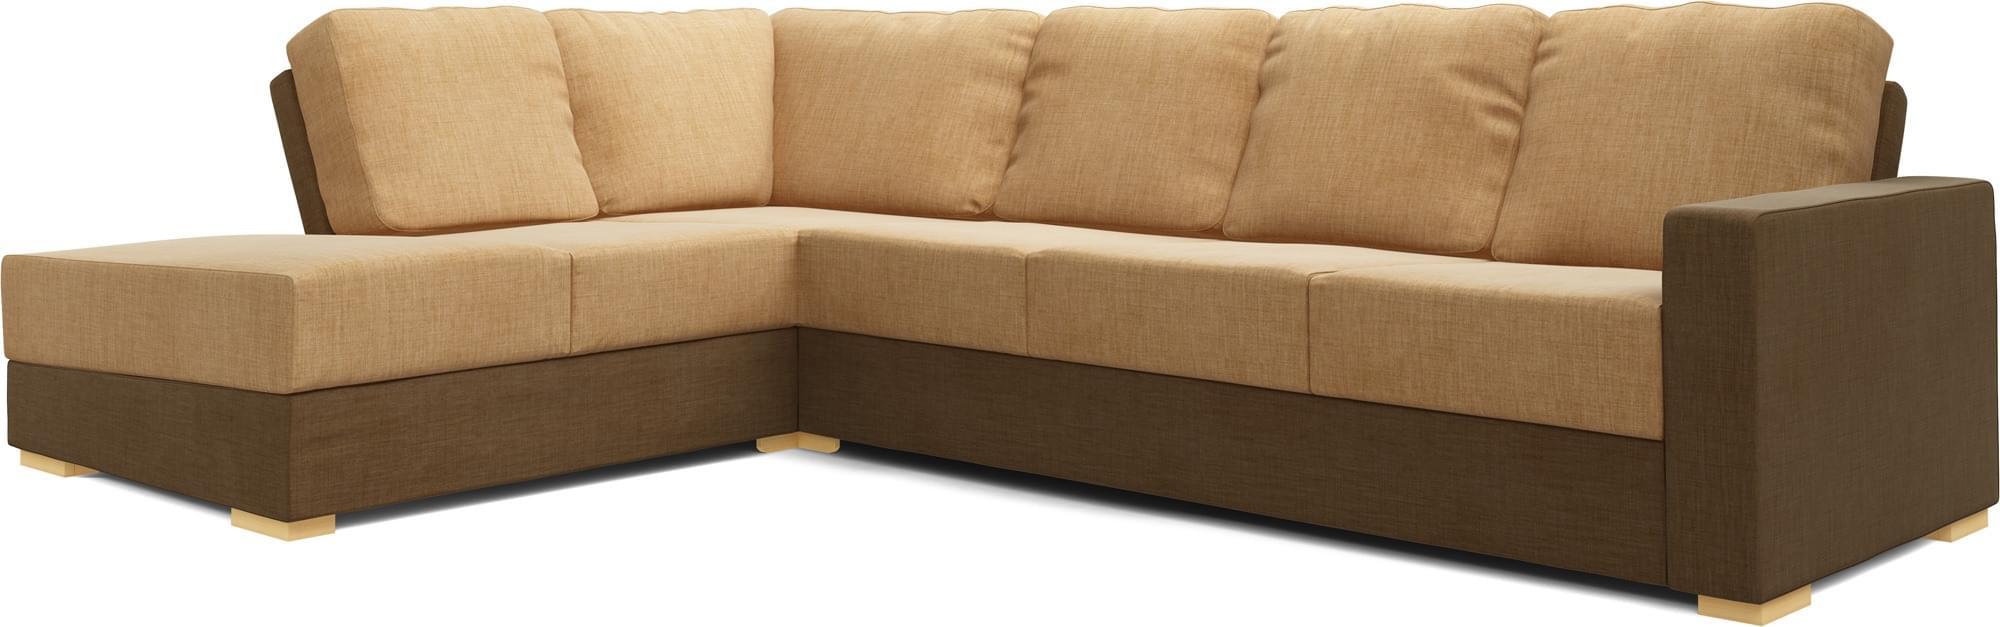 Lear chaise 4x3 corner sofa corner group sofas nabru for Barcelona chaise corner sofa